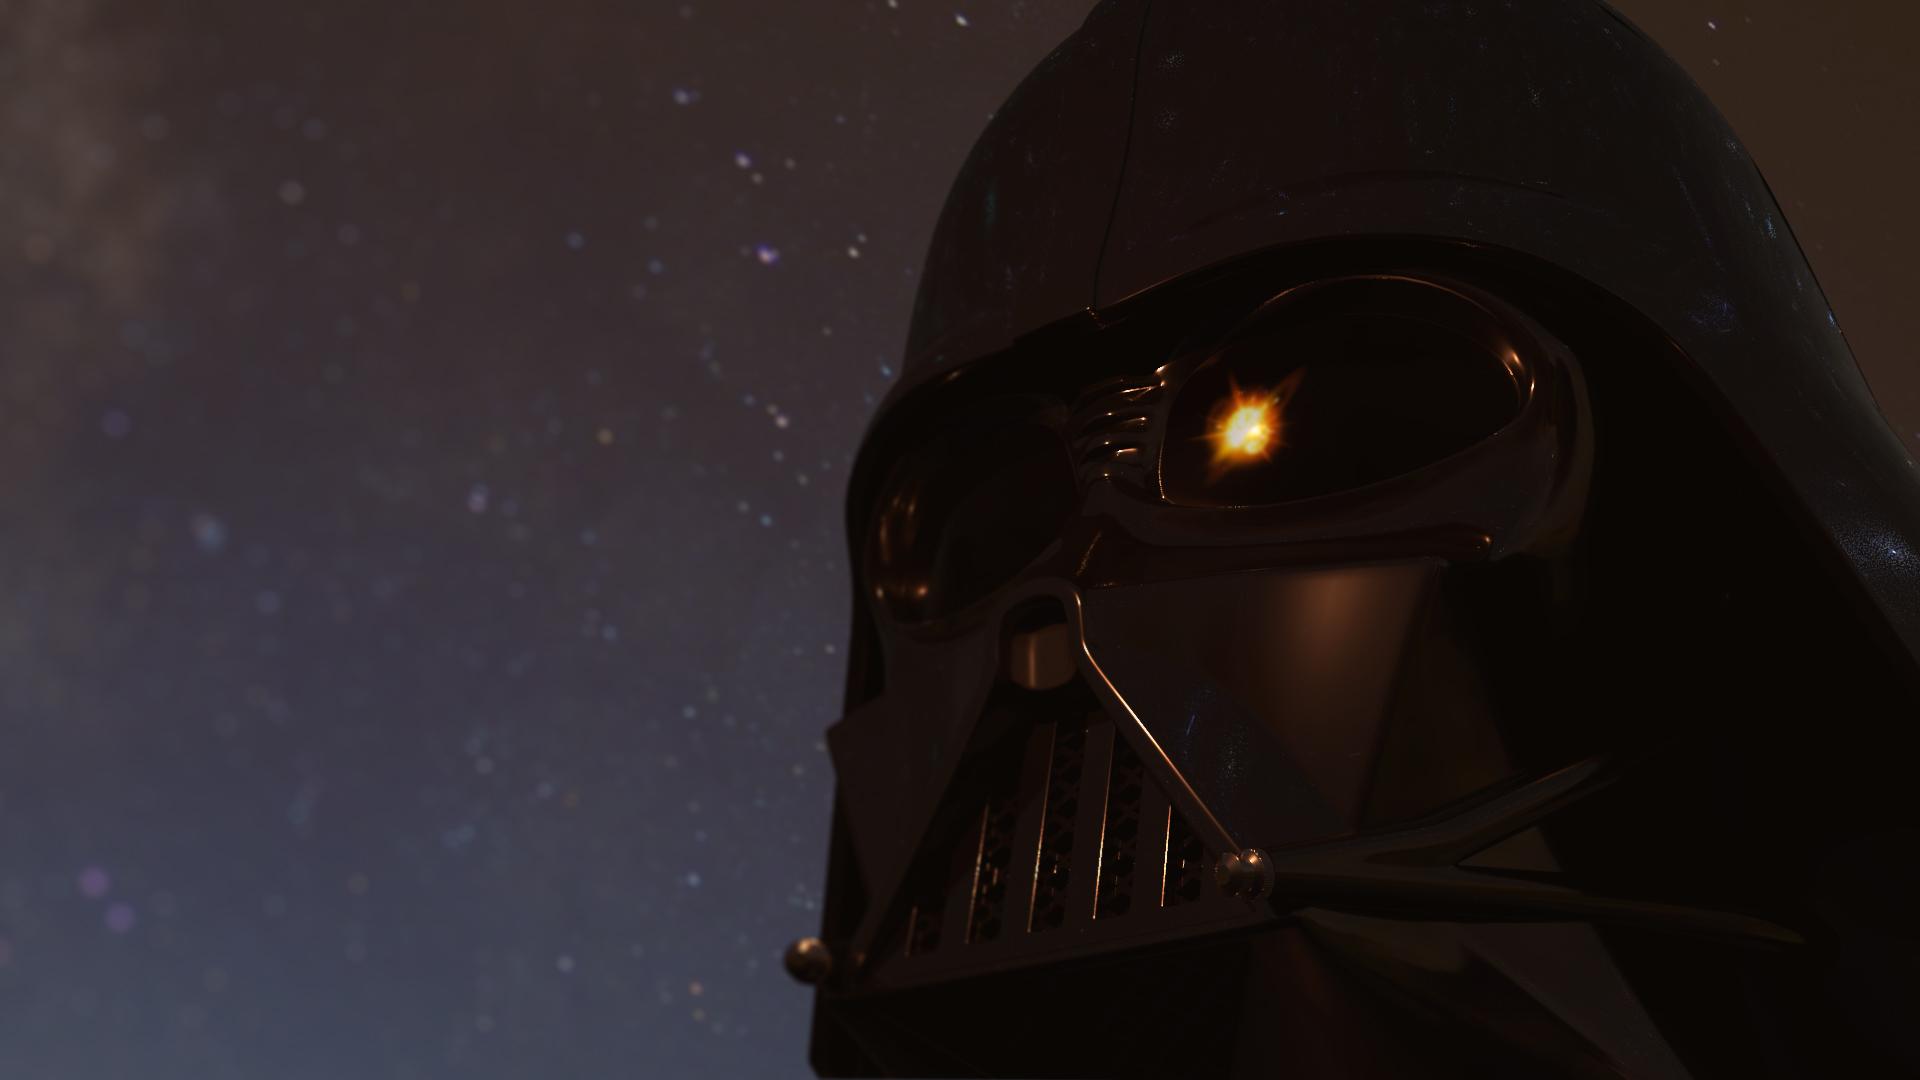 Wallpaper Darth Vader Star Wars Sith Star Wars Villains Anakin Skywalker 1920x1080 Lemalad 1942755 Hd Wallpapers Wallhere